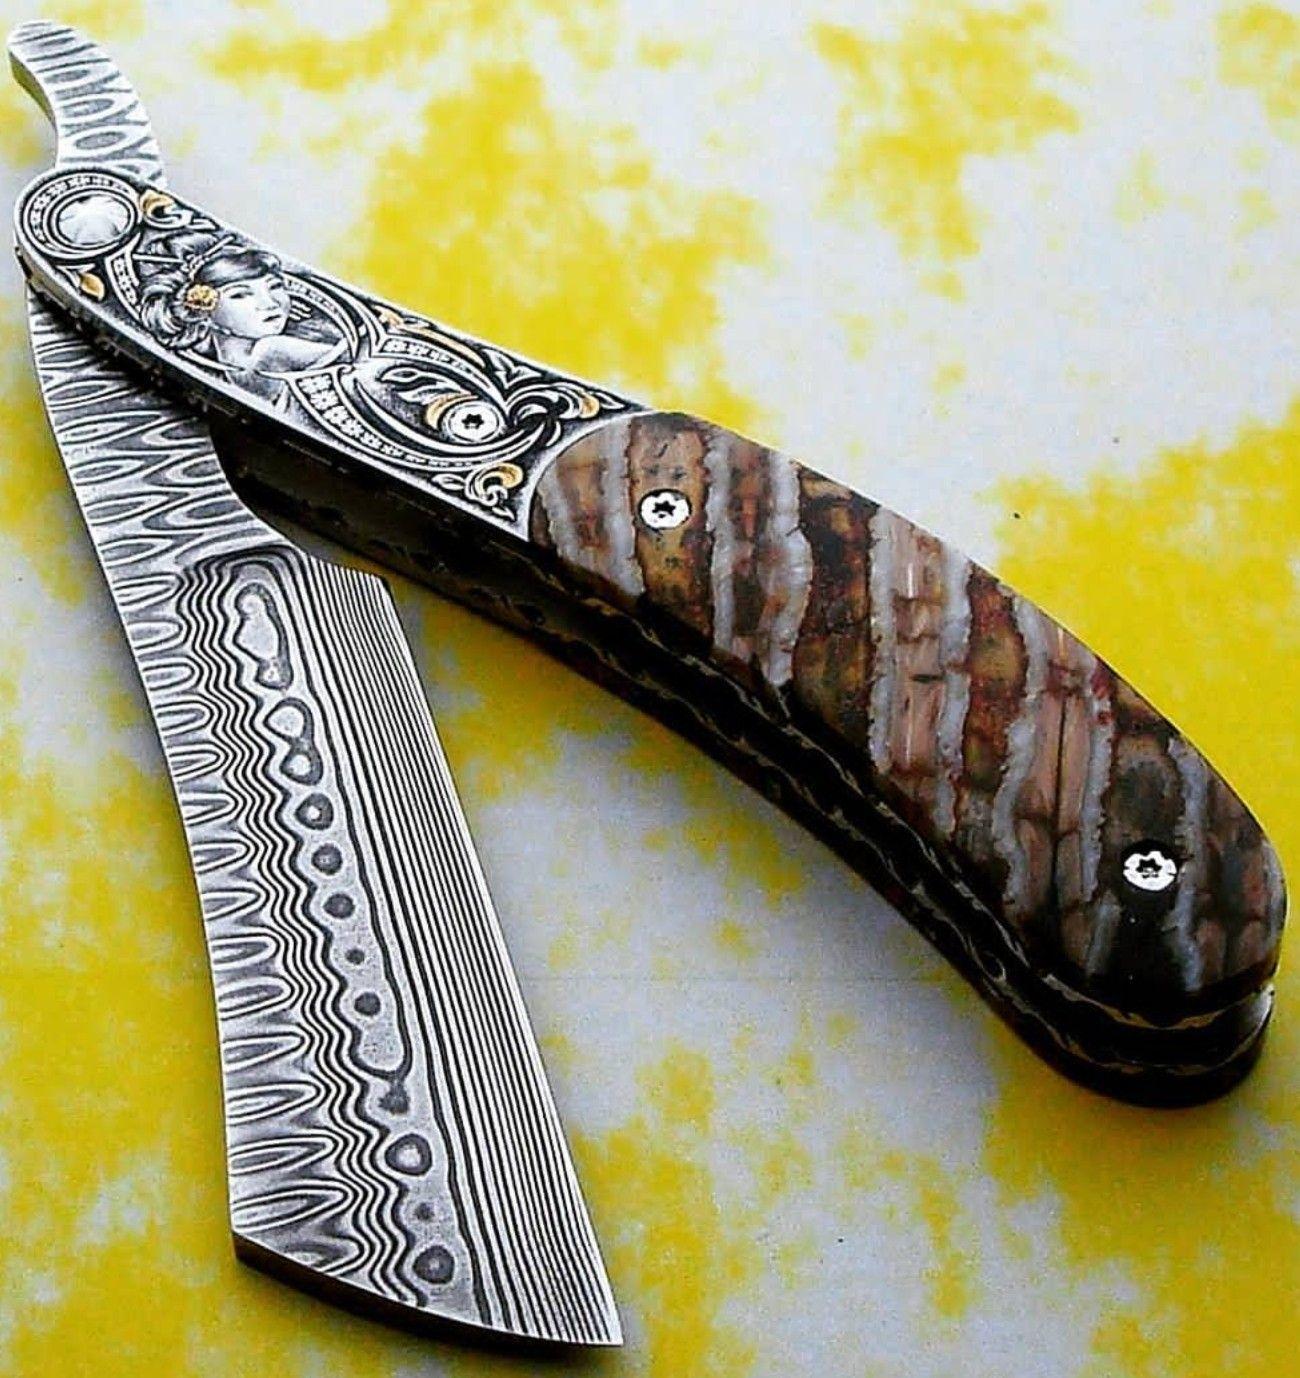 Consoli Knives Knife, Straight razor, Straight razor shaving